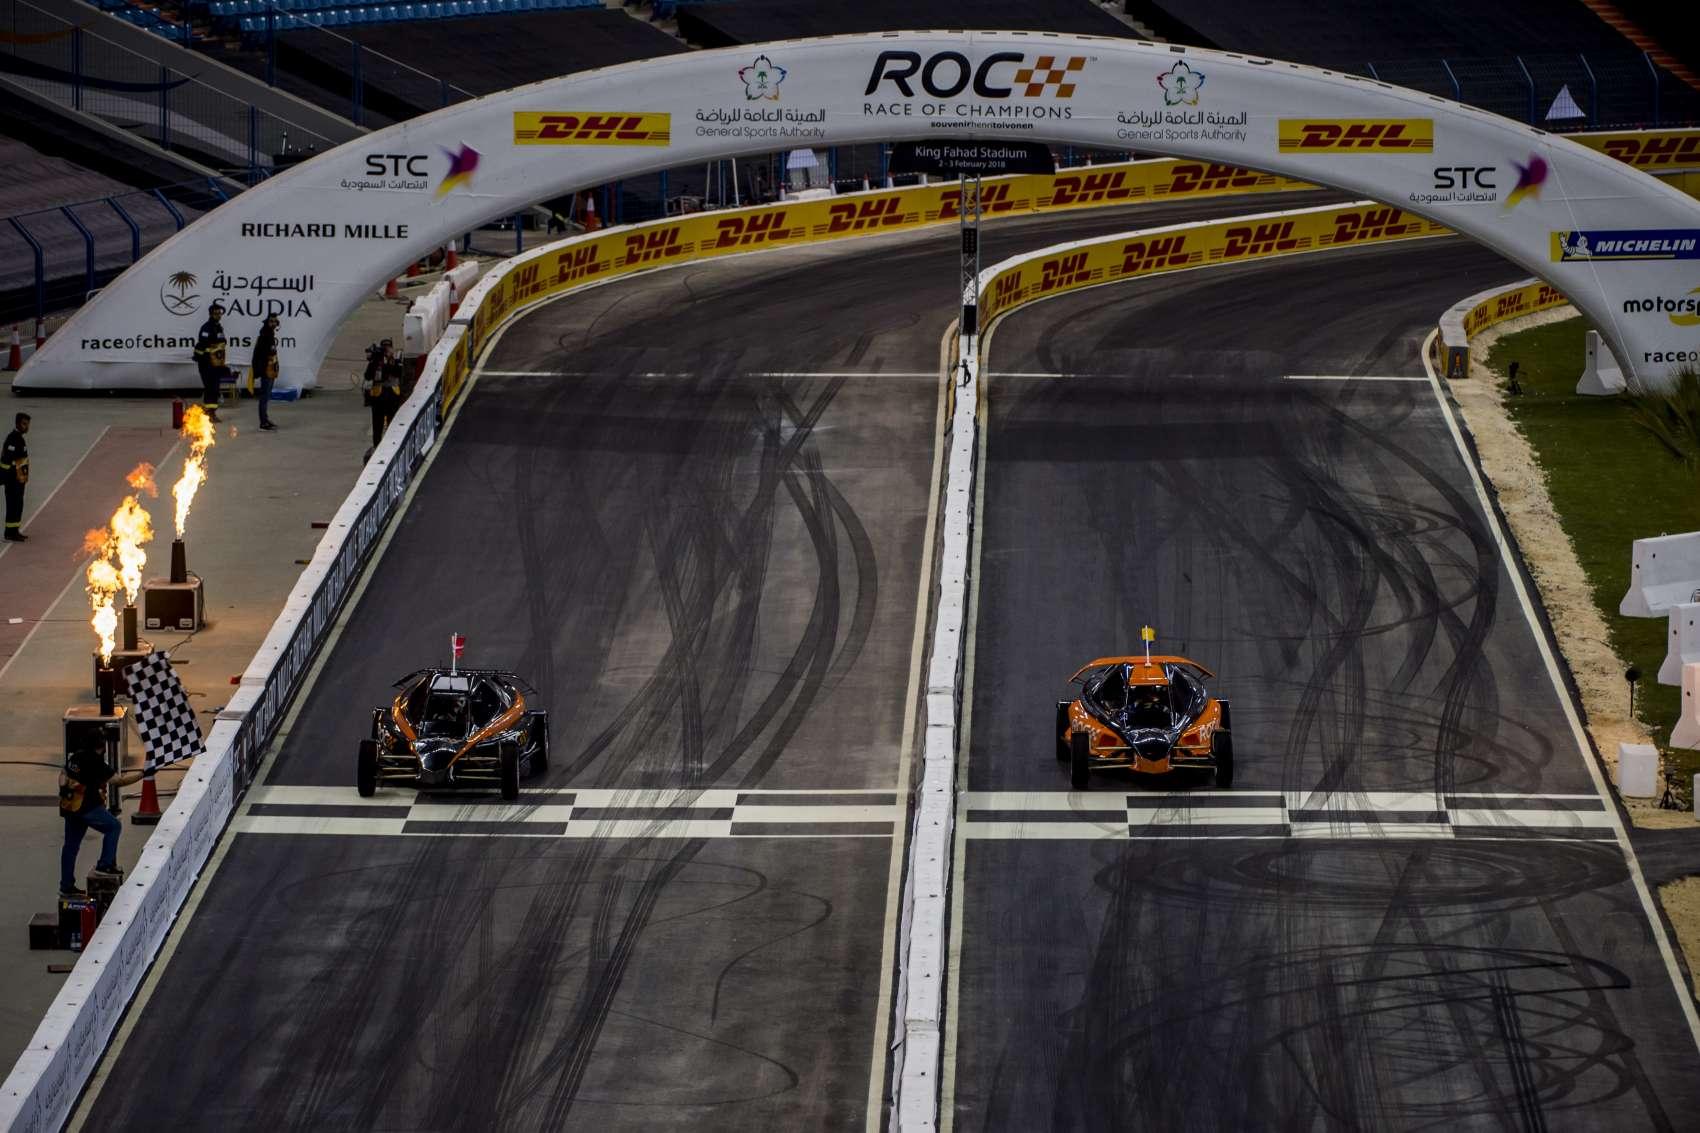 RoC, racingline, racingline.hu, racingline